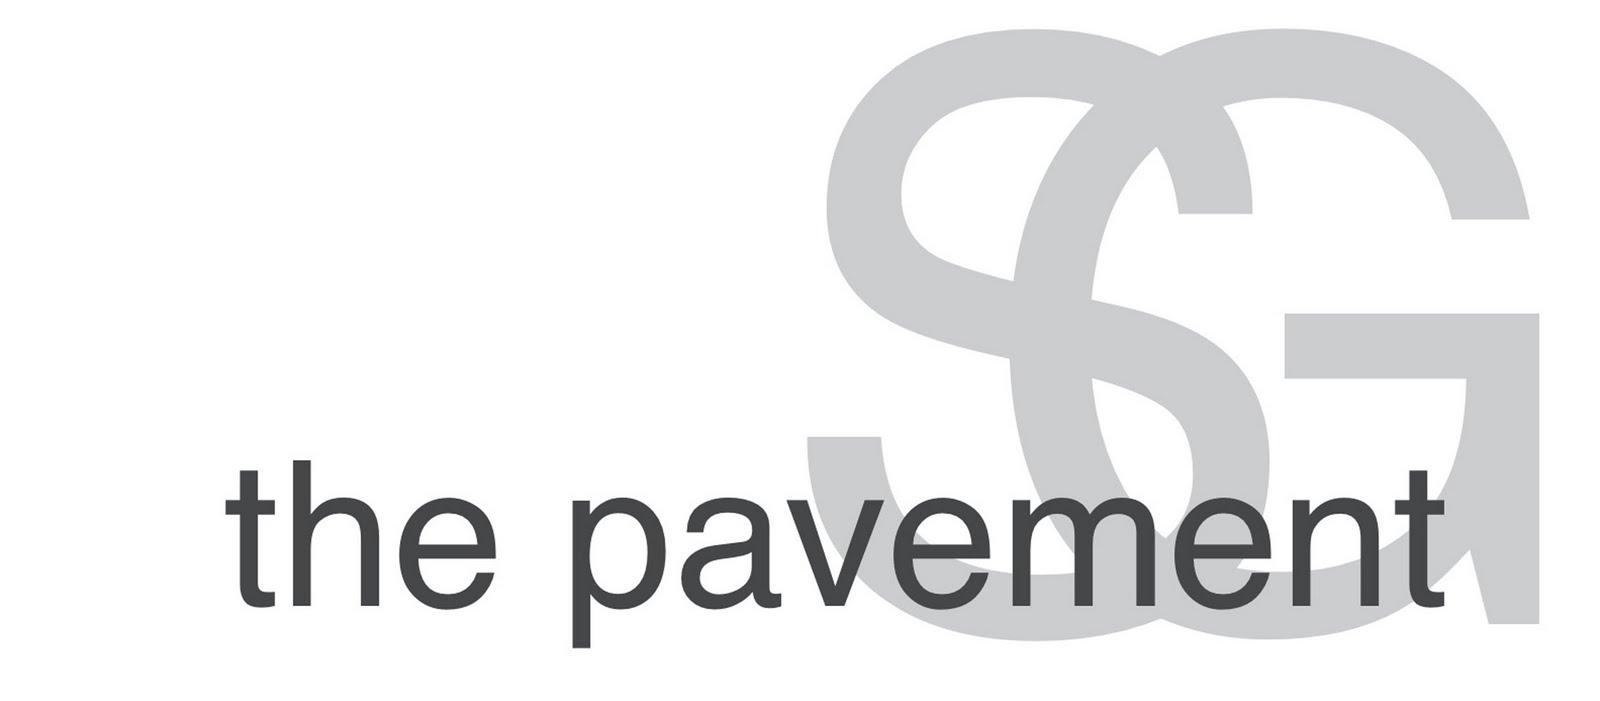 the pavement